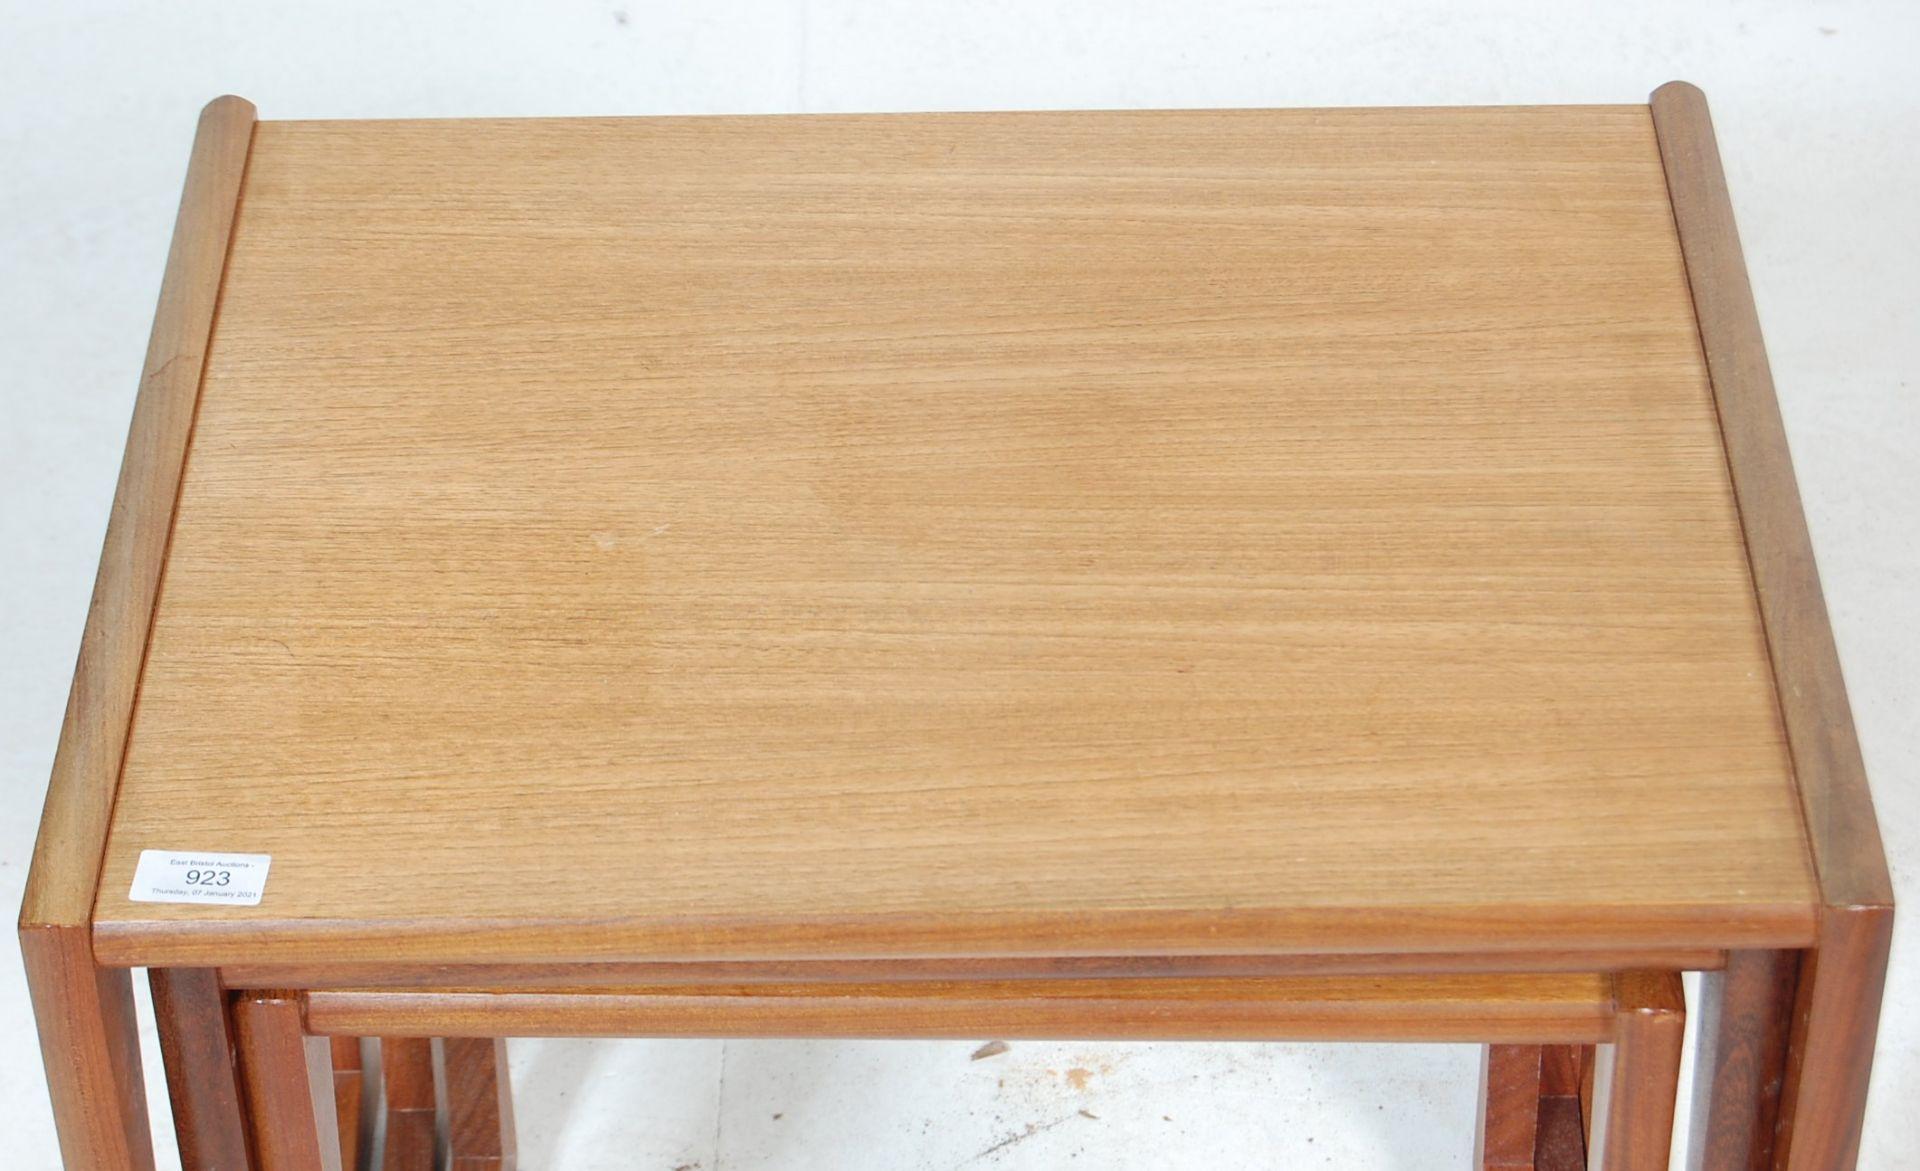 A RETRO 1960'S TEAK WOOD G PLAN FRESCO NEST OF TABLES - Image 3 of 4